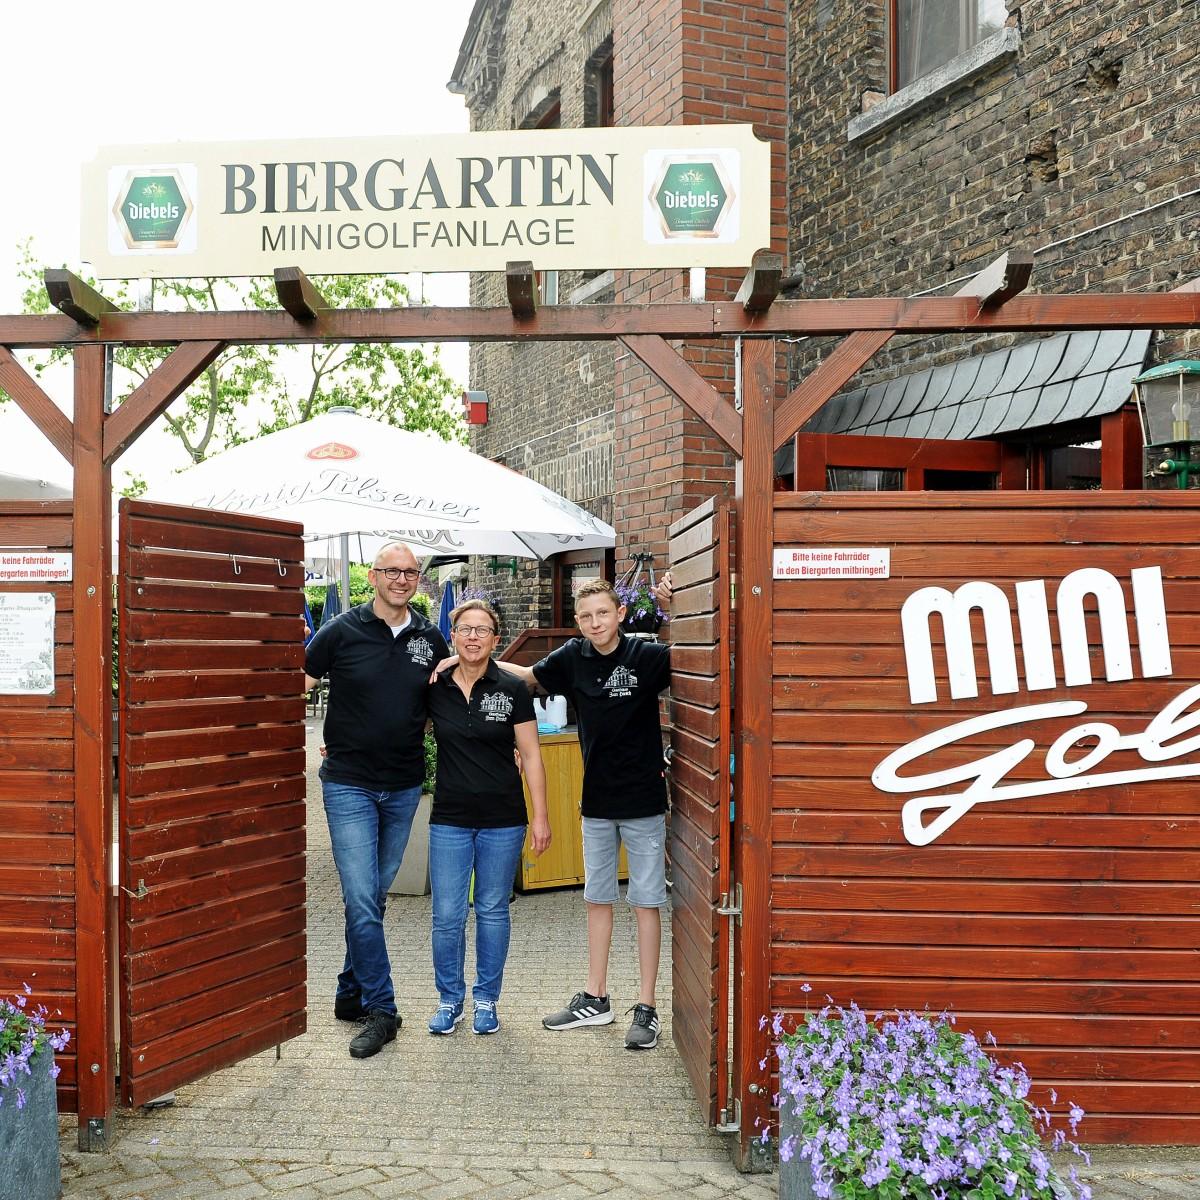 Rees Gasthaus Zum Hirsch Lockt Familien In Den Biergarten Nrz De